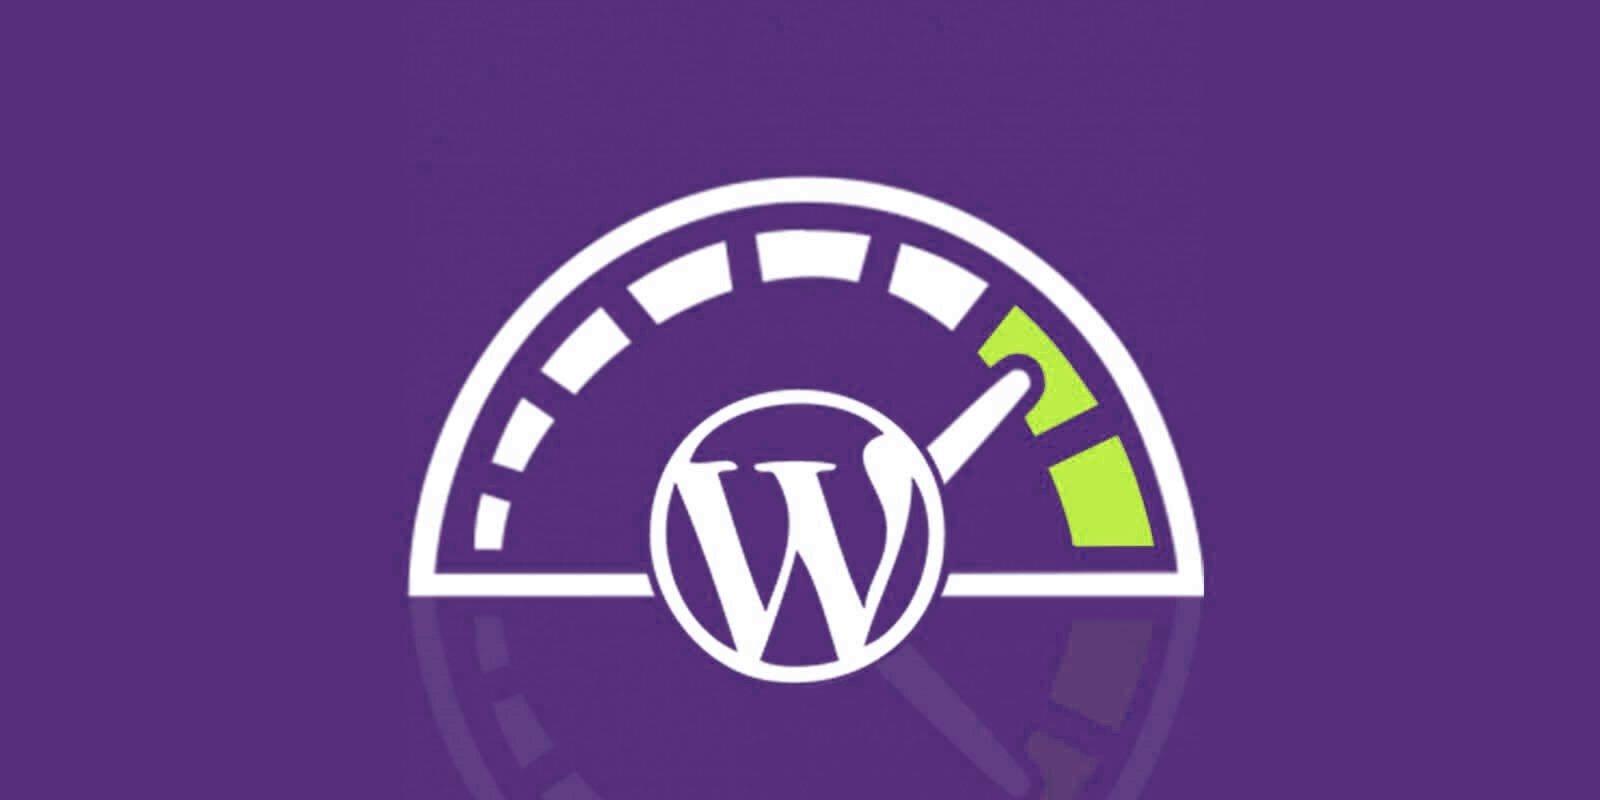 Speed WordPress - WordPress πως μπορεί να τρέξει γρηγορότερα;